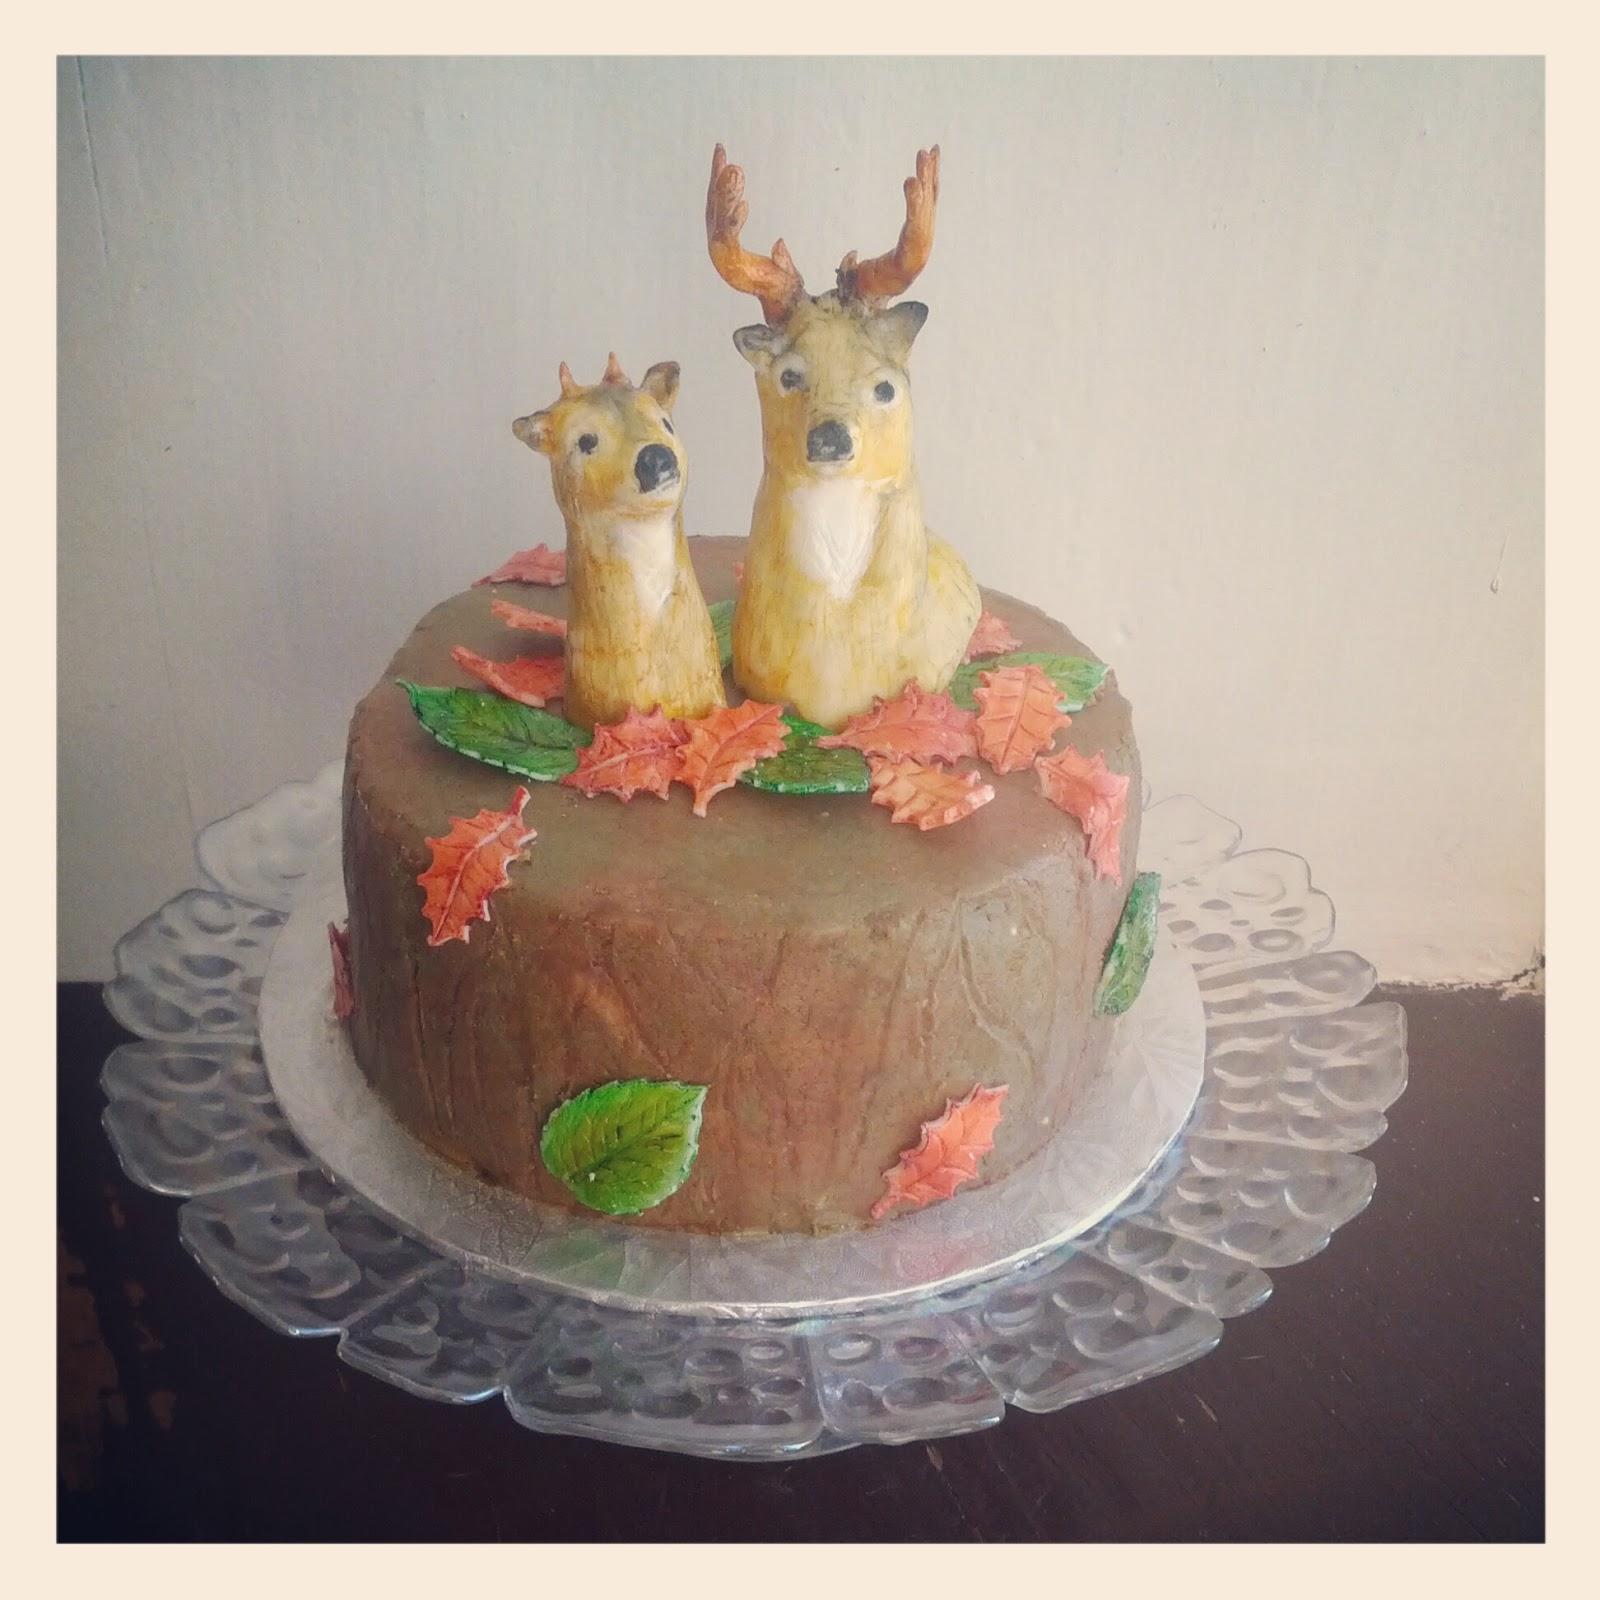 Second Generation Cake Design Deer Head Birthday Cake